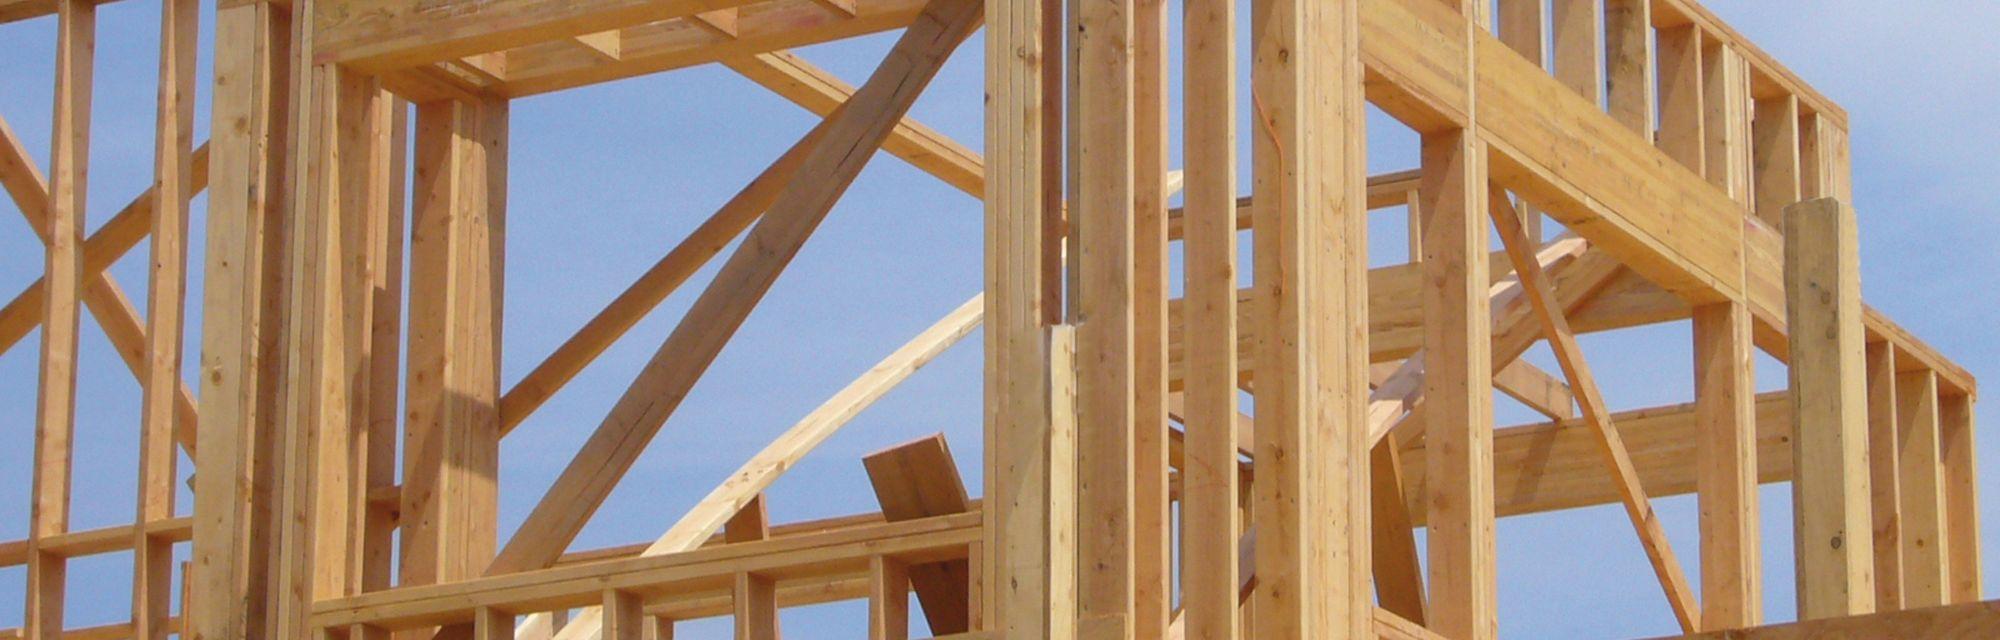 Profiled timber | binderholz